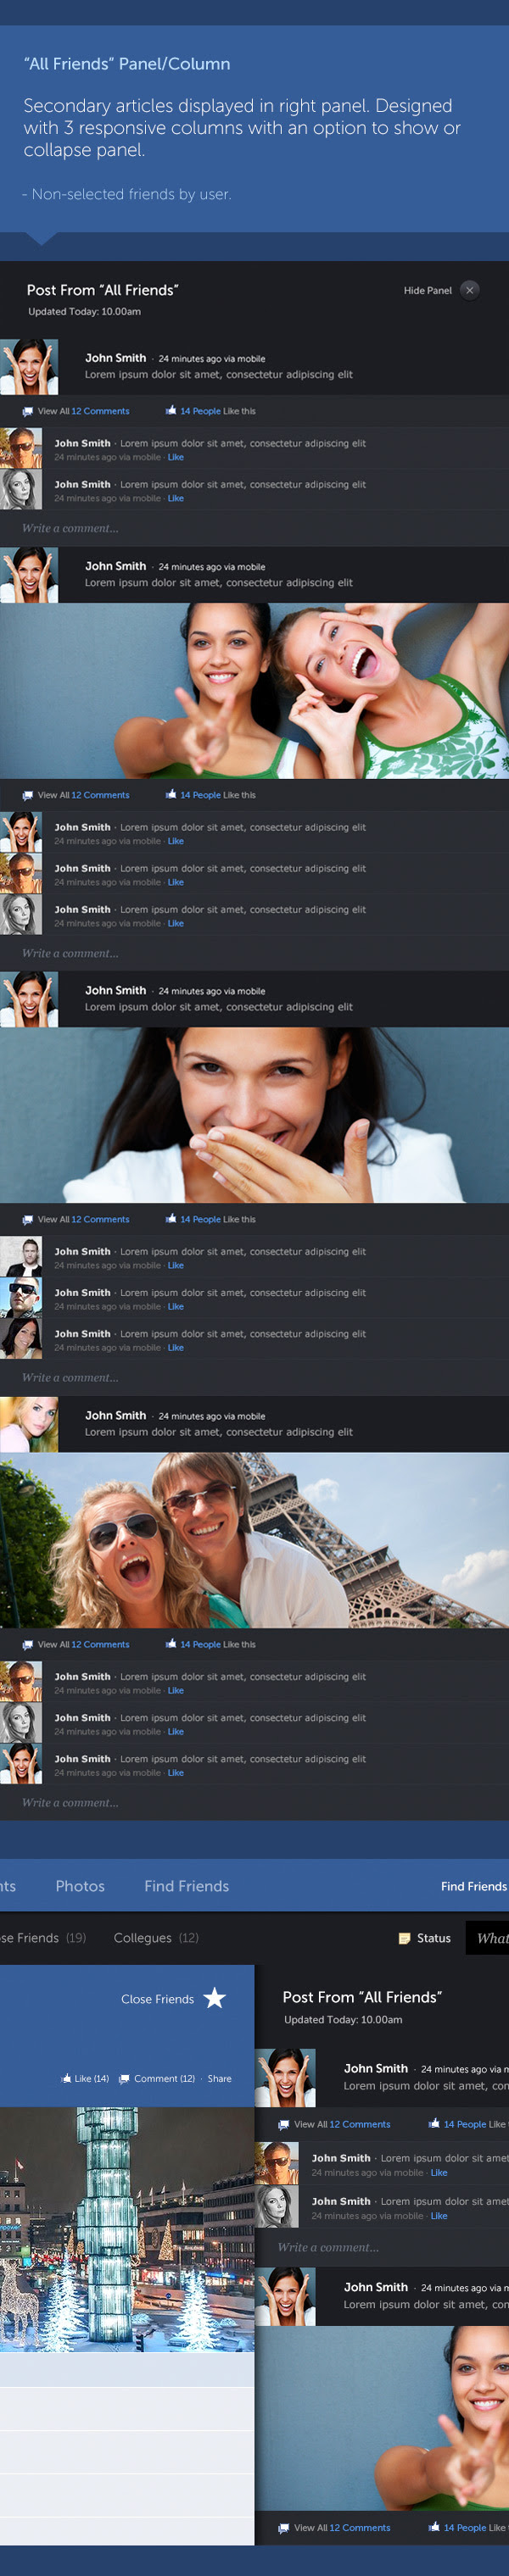 facebook-proposal-redesign-interface-04